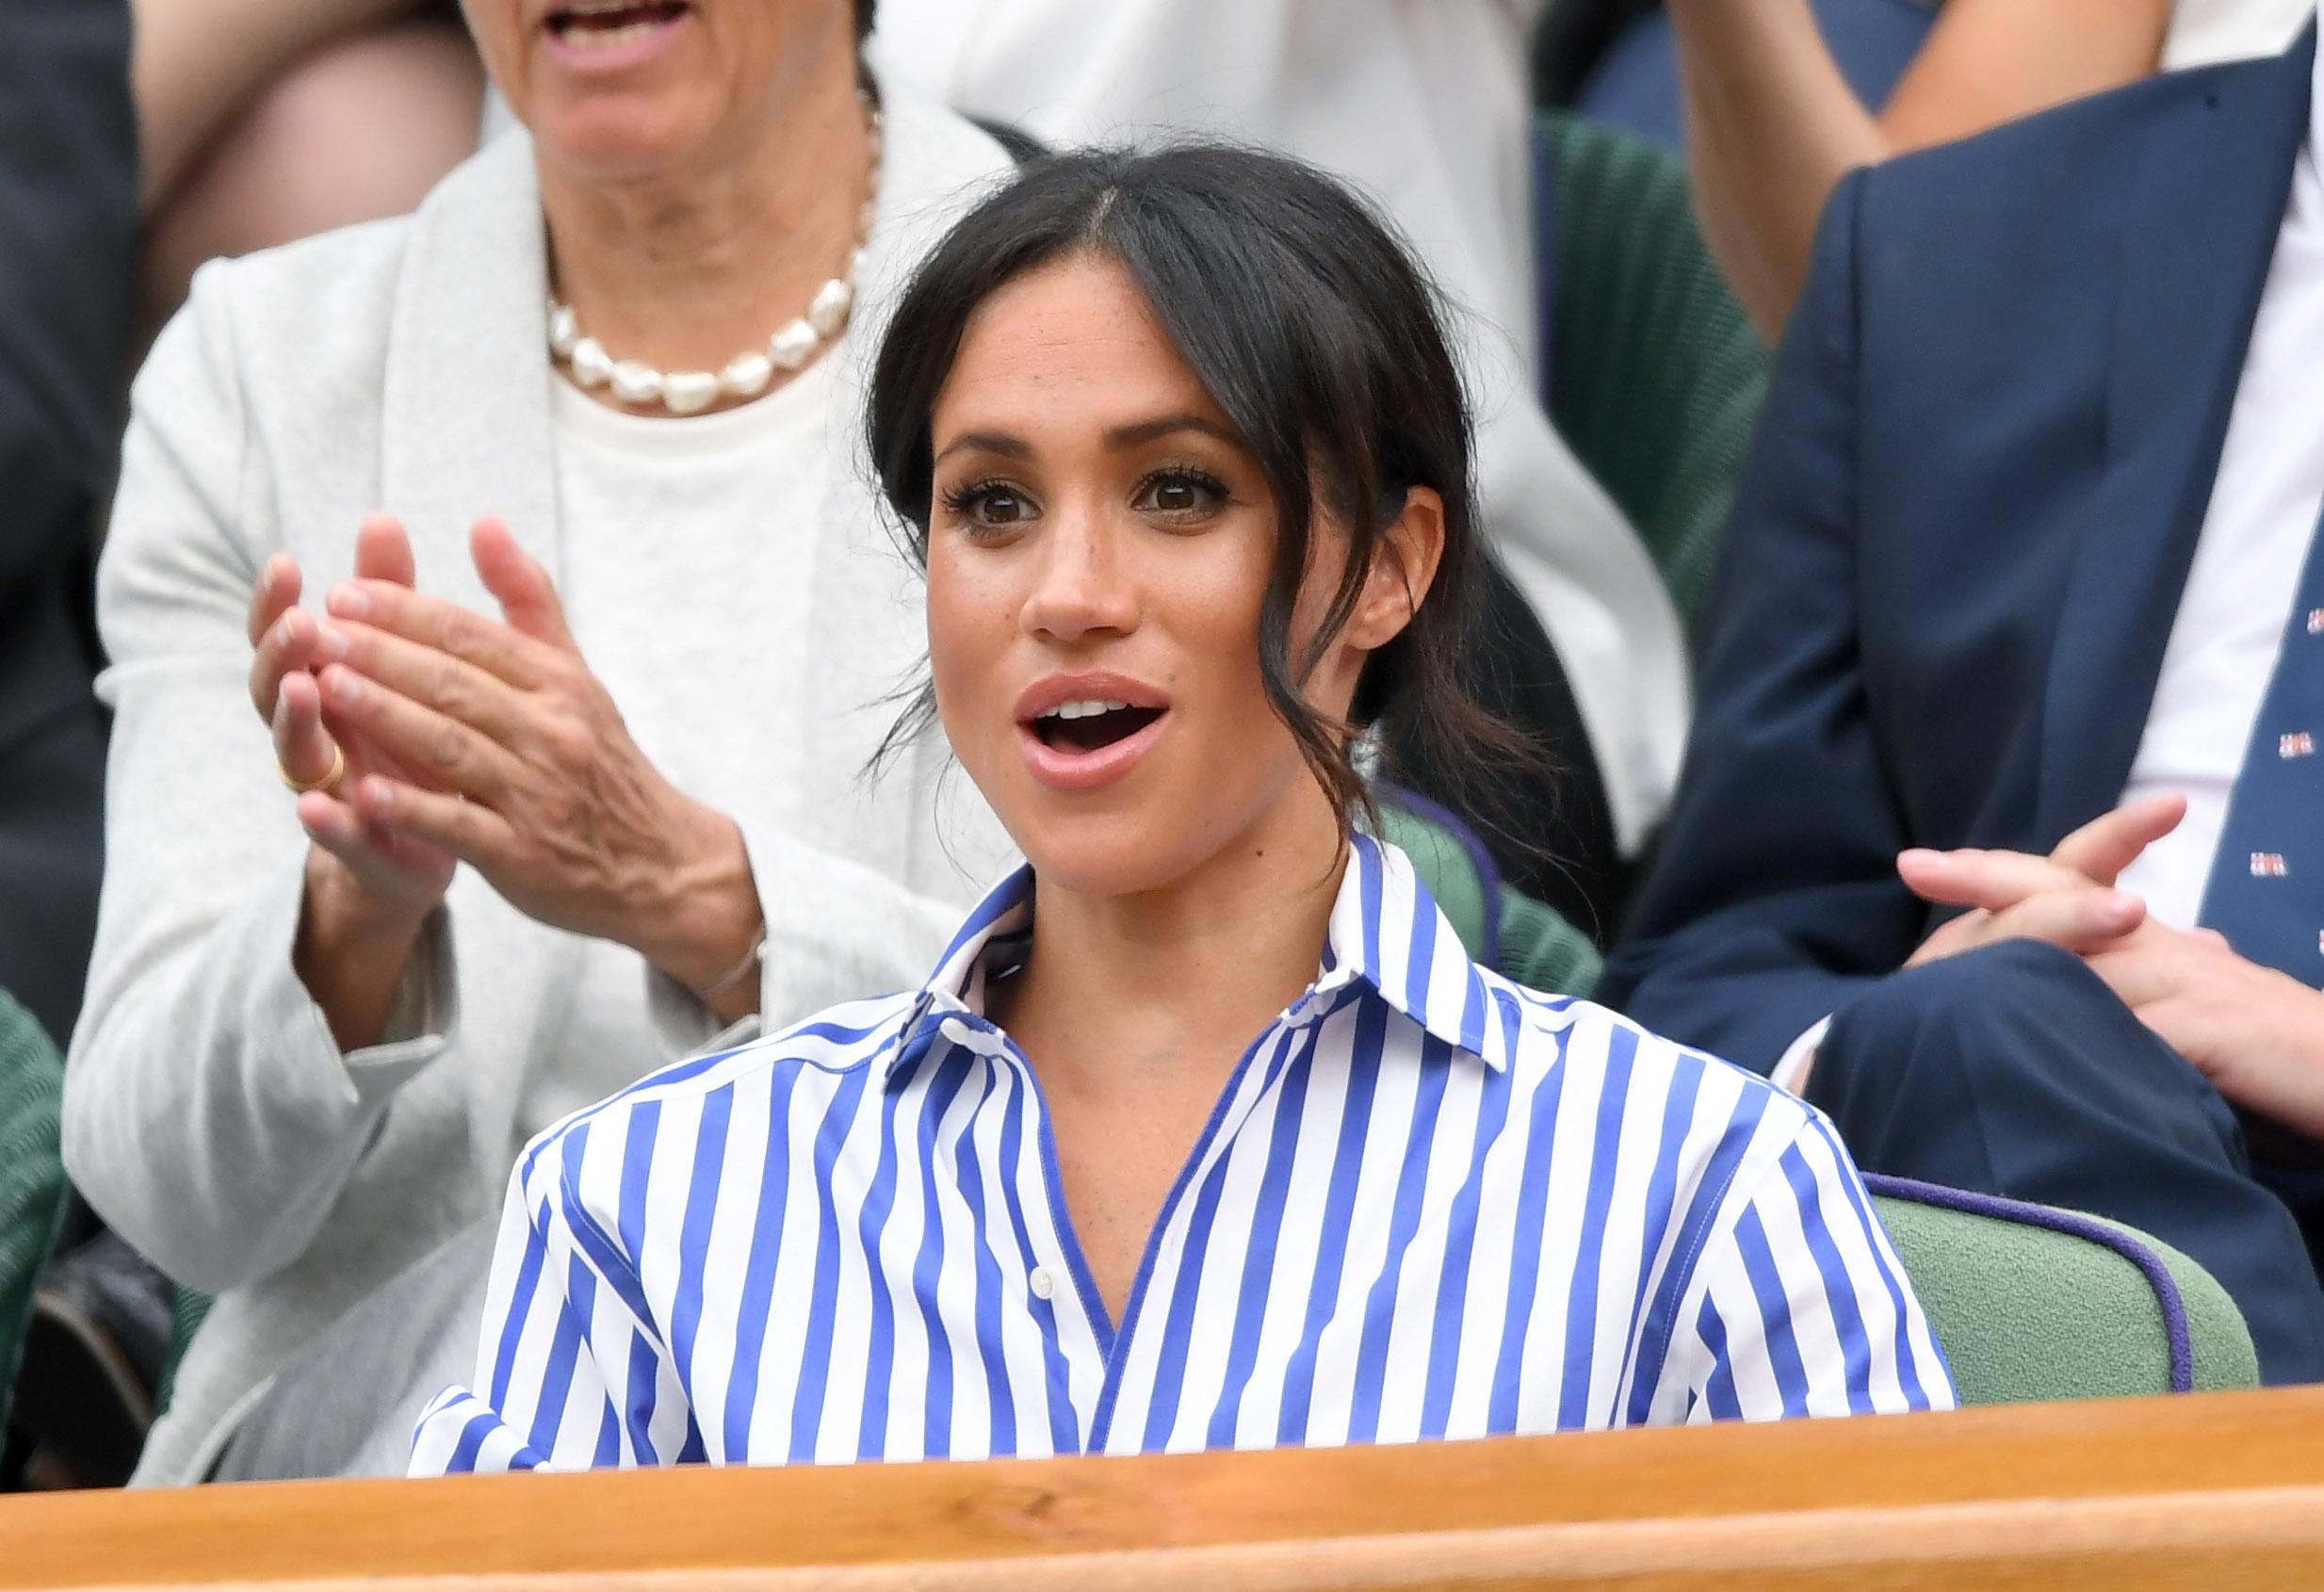 e41e6c15bae Meghan Markle Wasn t Allowed to Wear Her Chic Fedora Hat at Wimbledon for a  Weird Reason